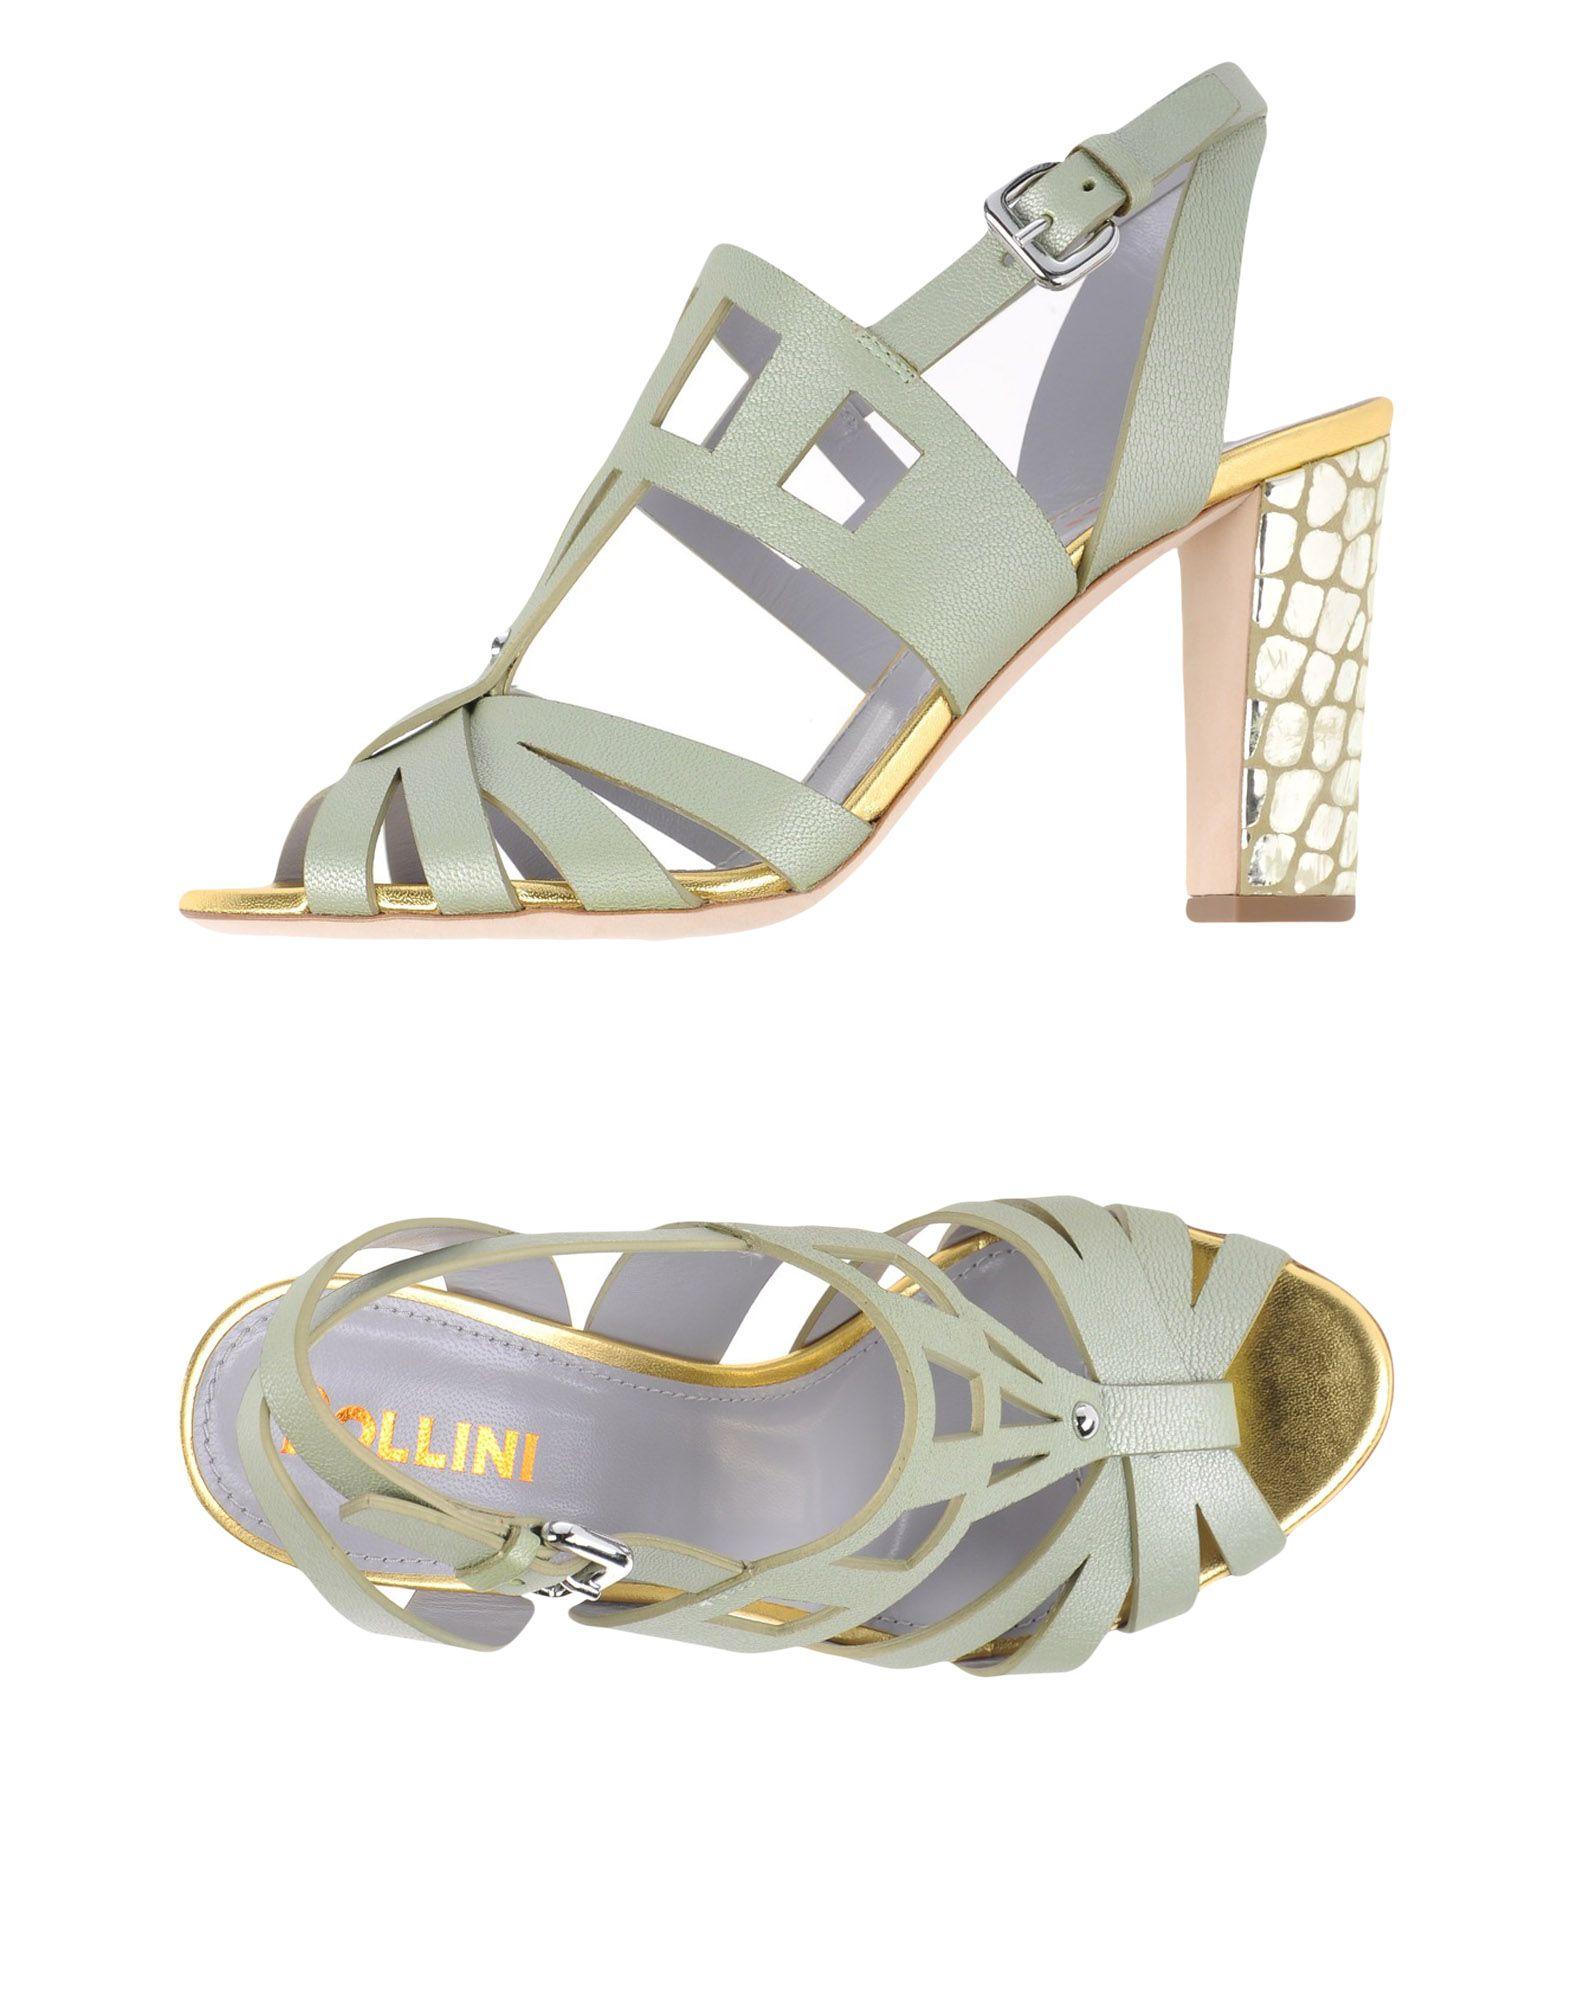 Pollini Schuhe Sandalen Damen  11331940RH Gute Qualität beliebte Schuhe Pollini 2a3b44